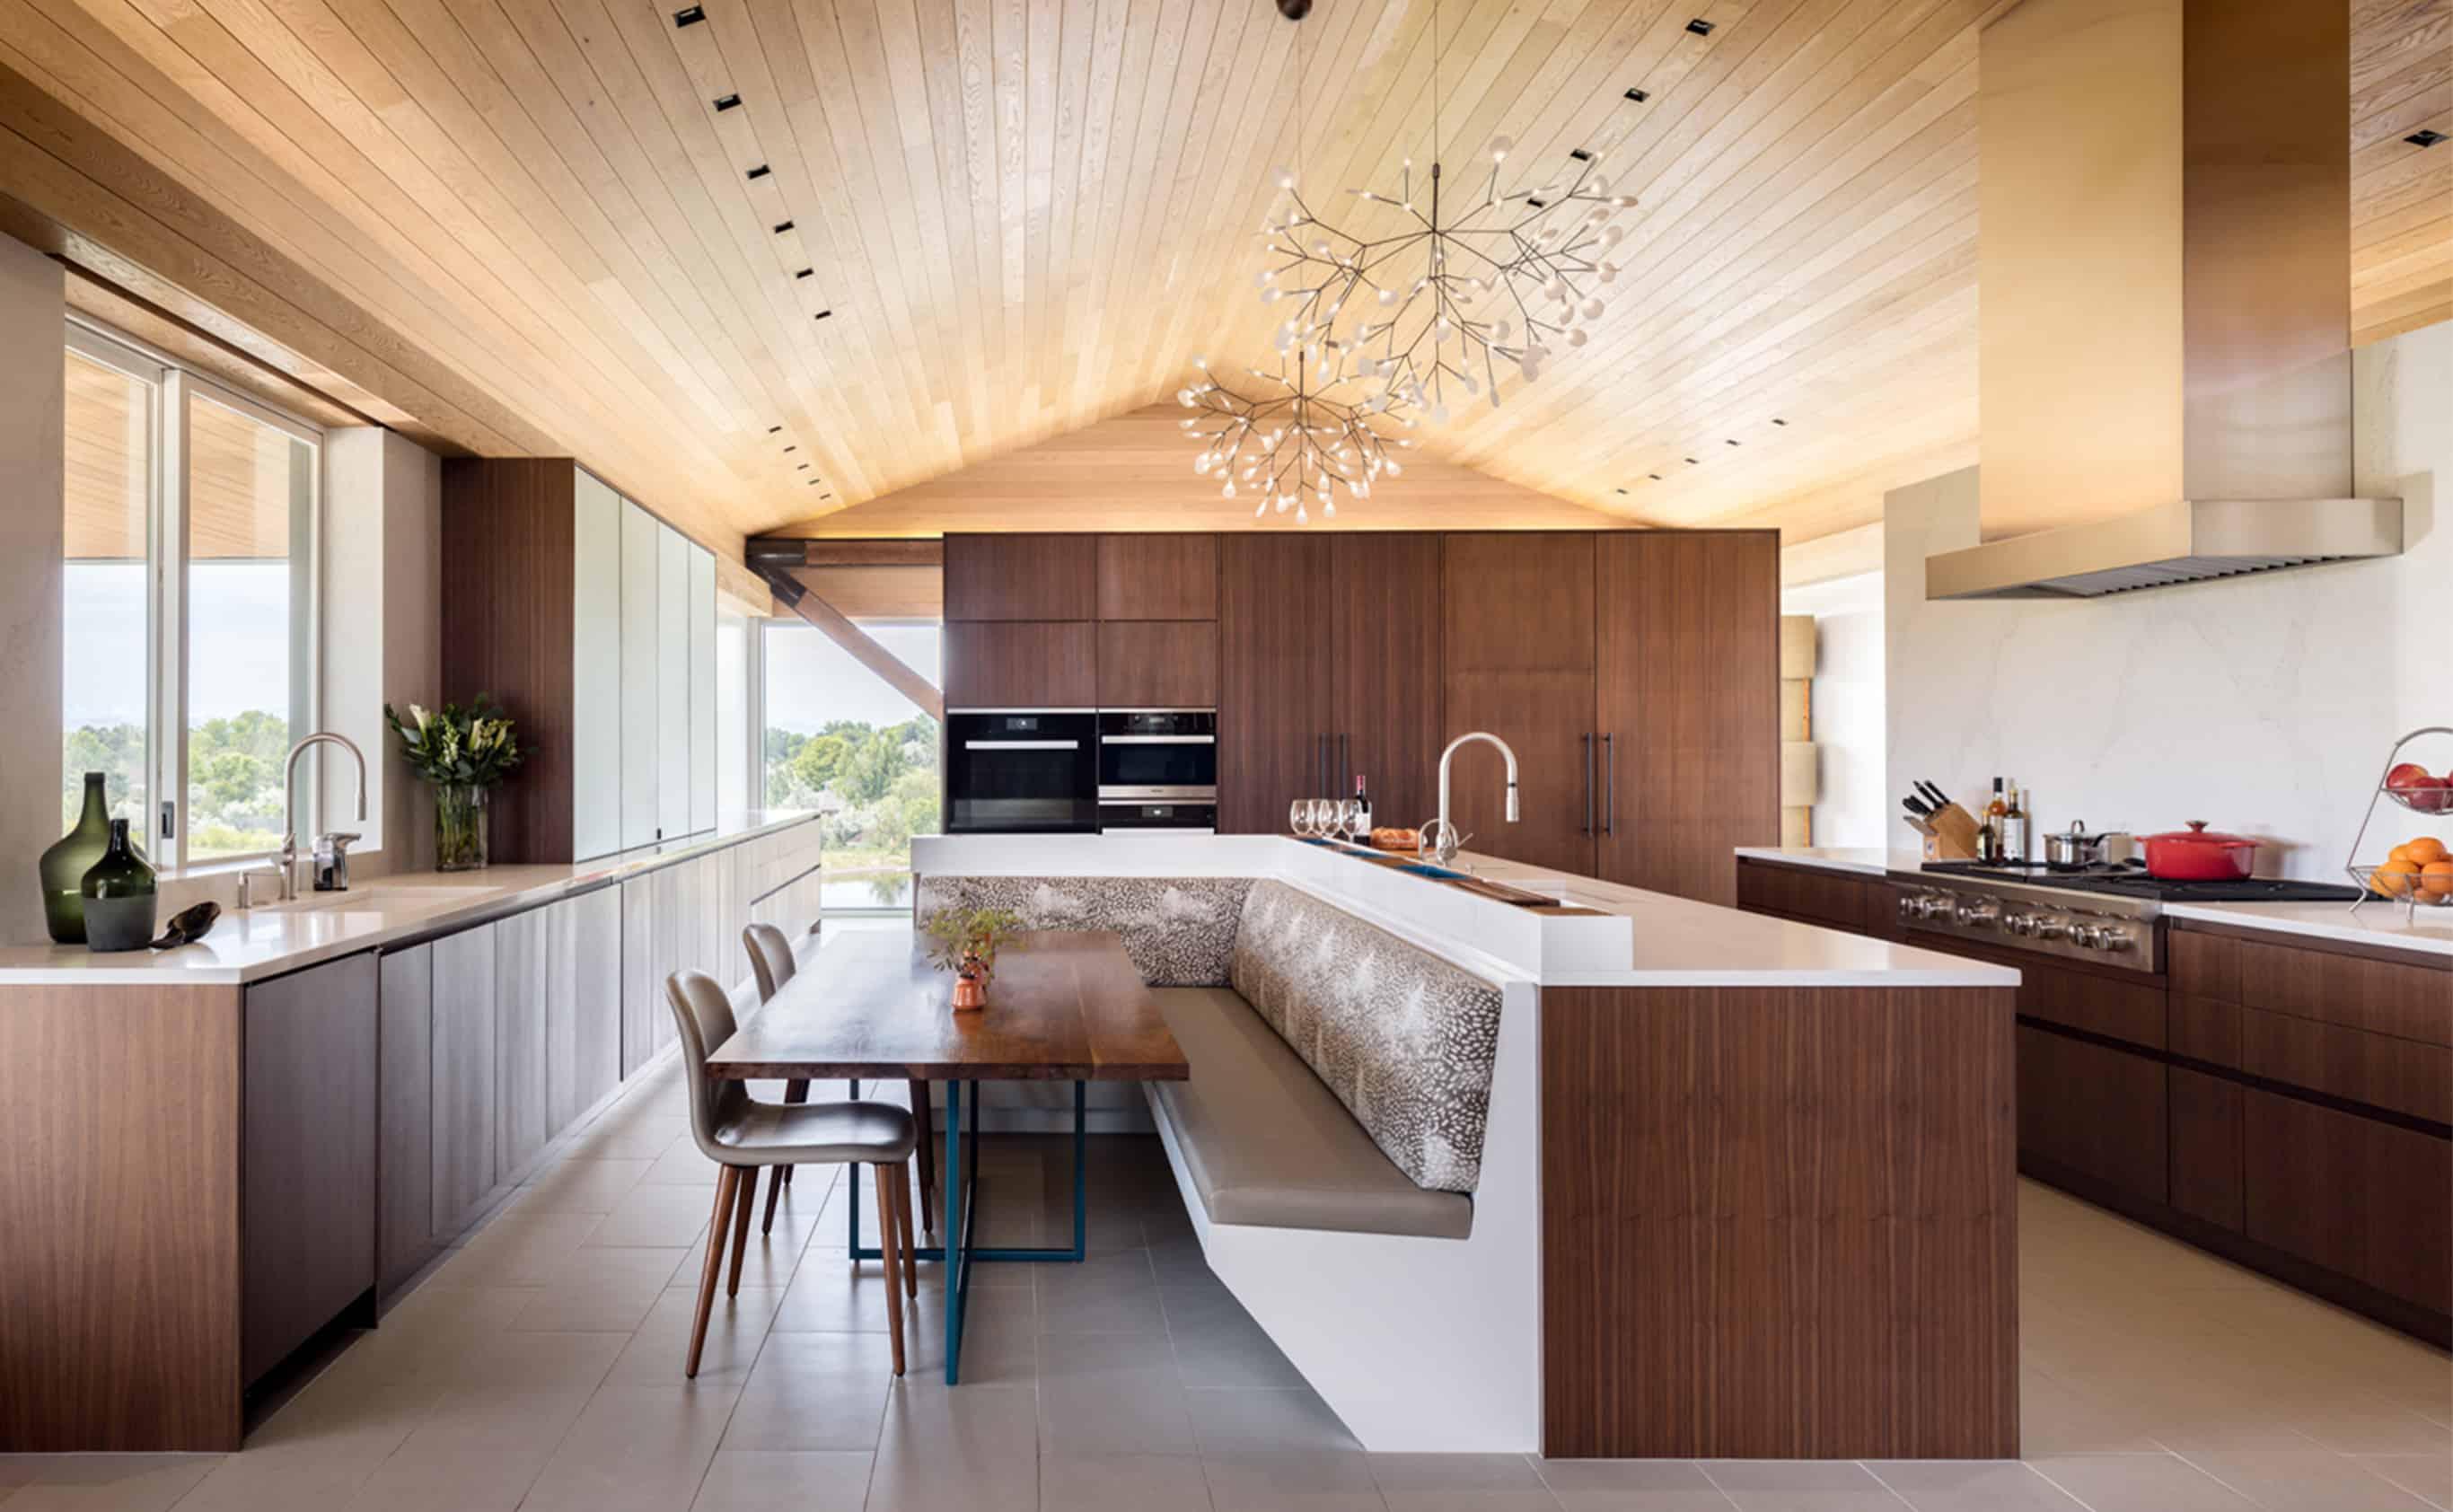 Home Duet Design Group